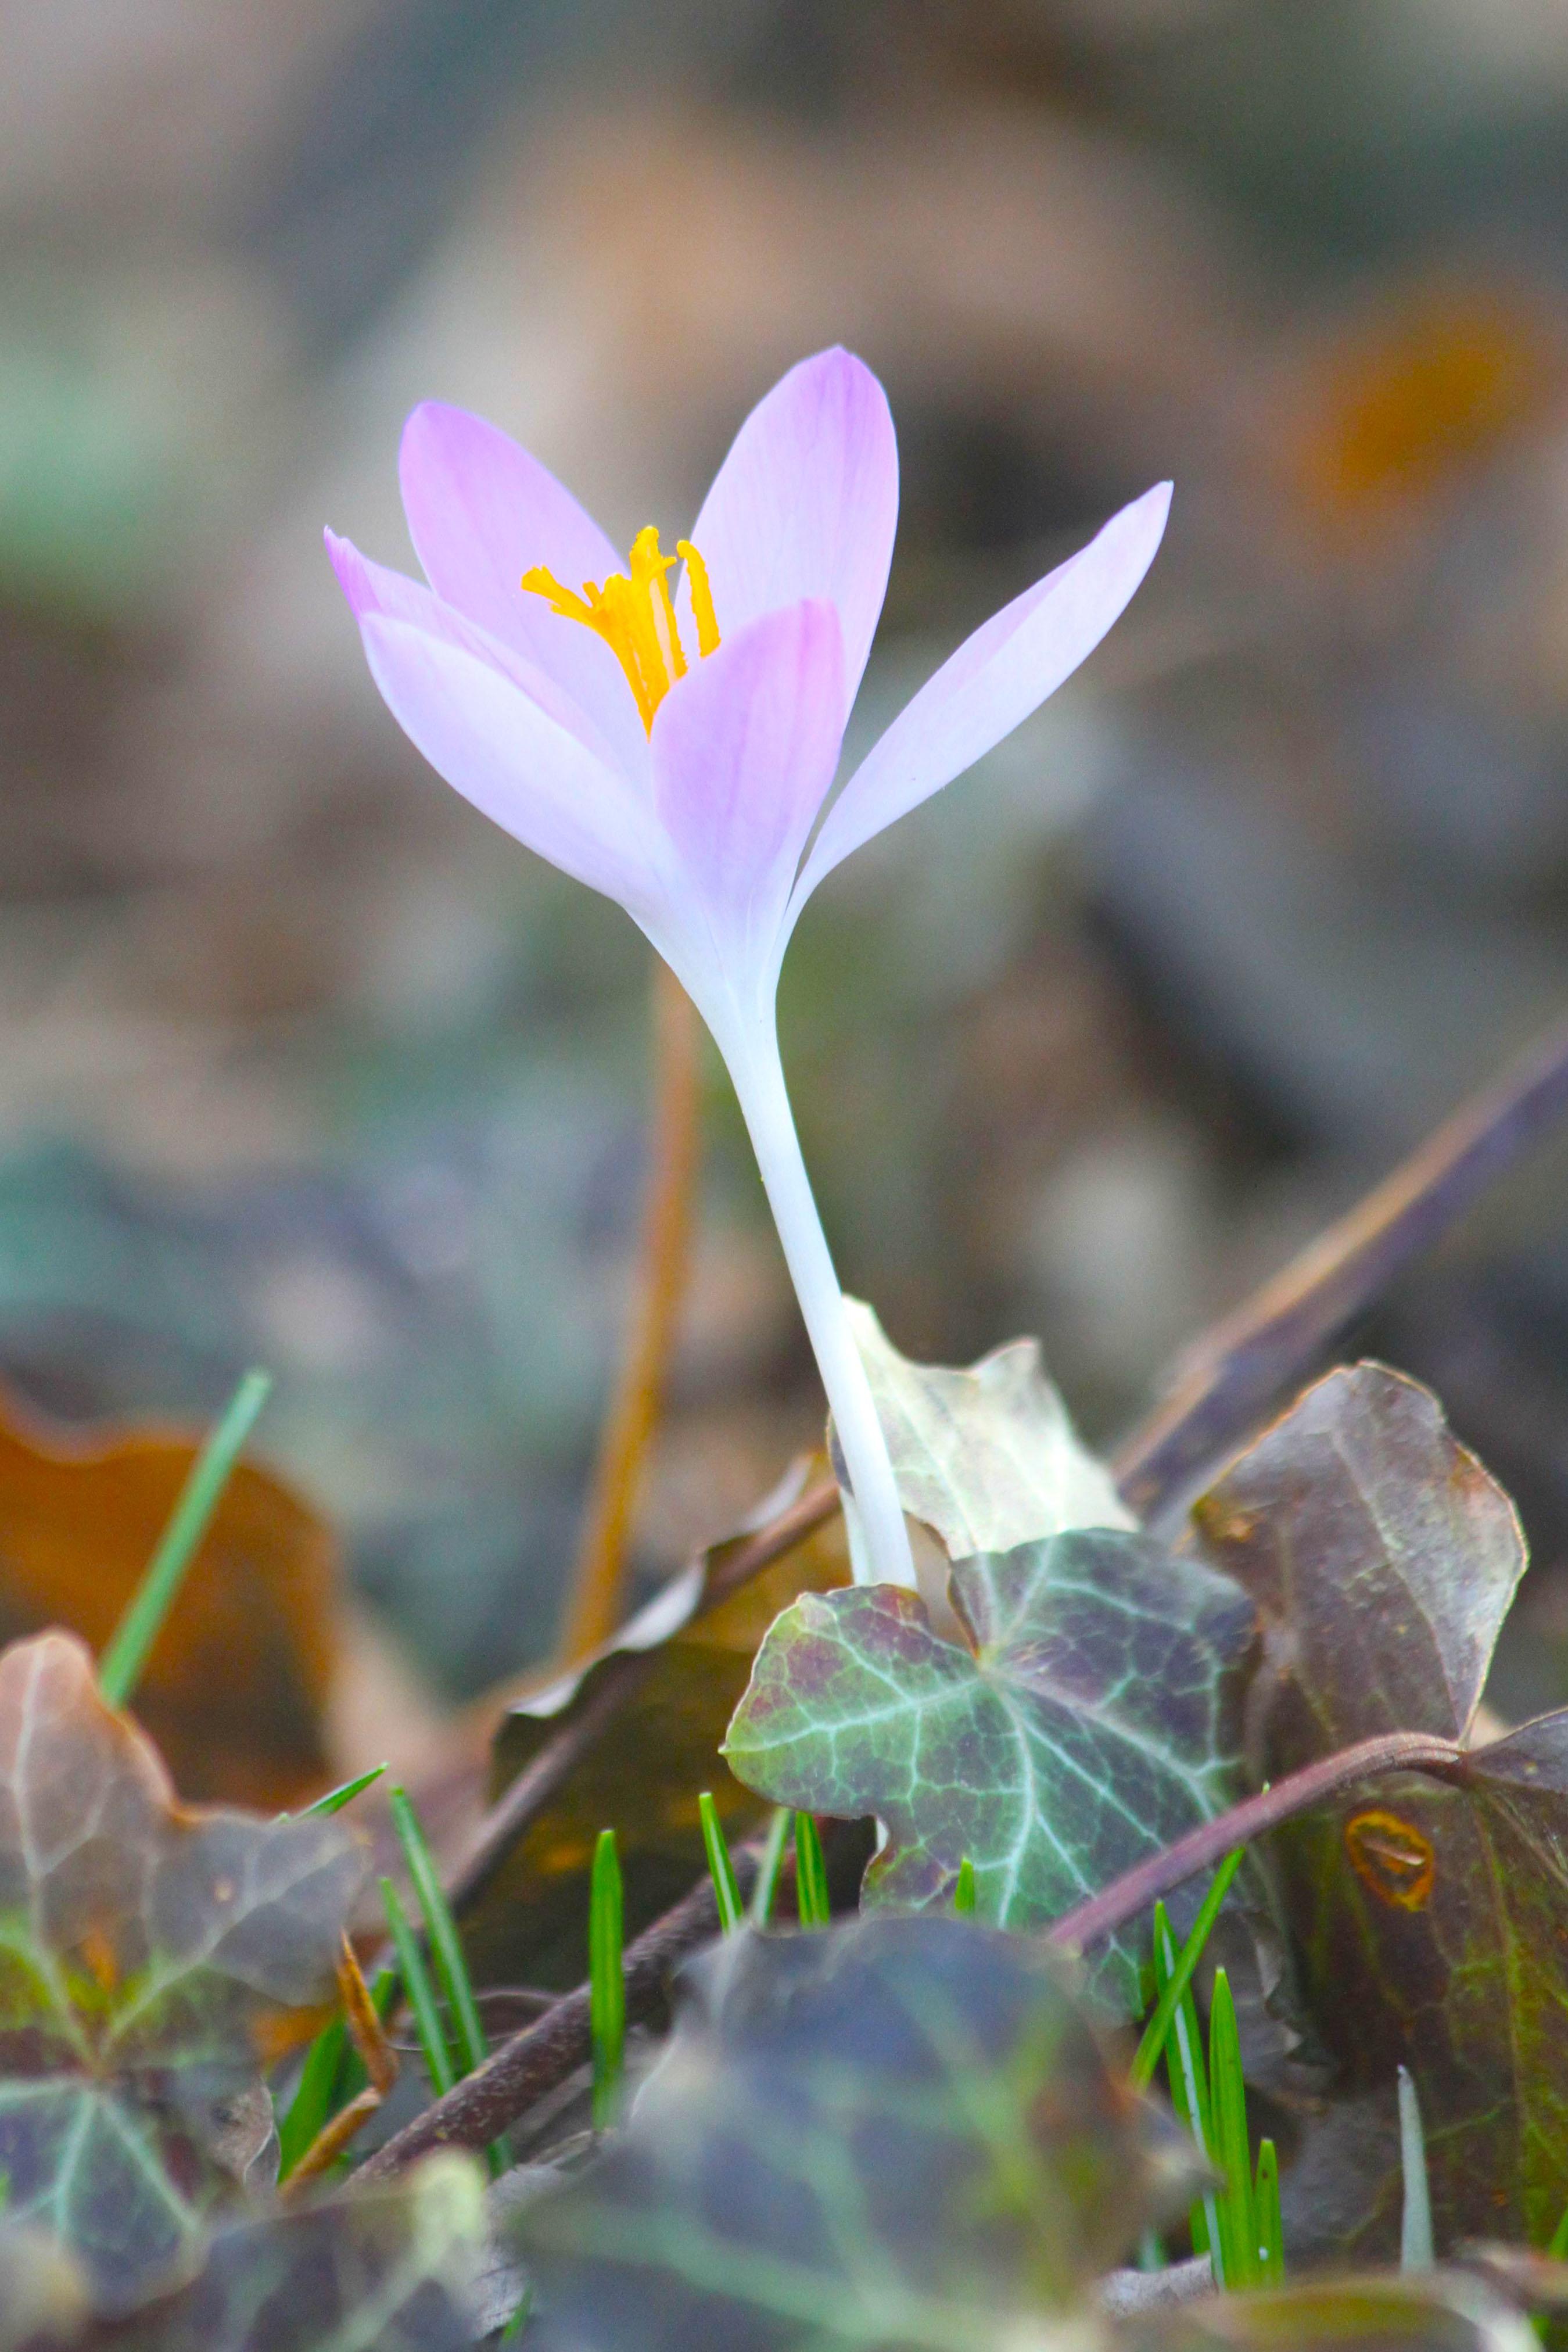 A flower seen on that Wednesday evening. Lucky me.